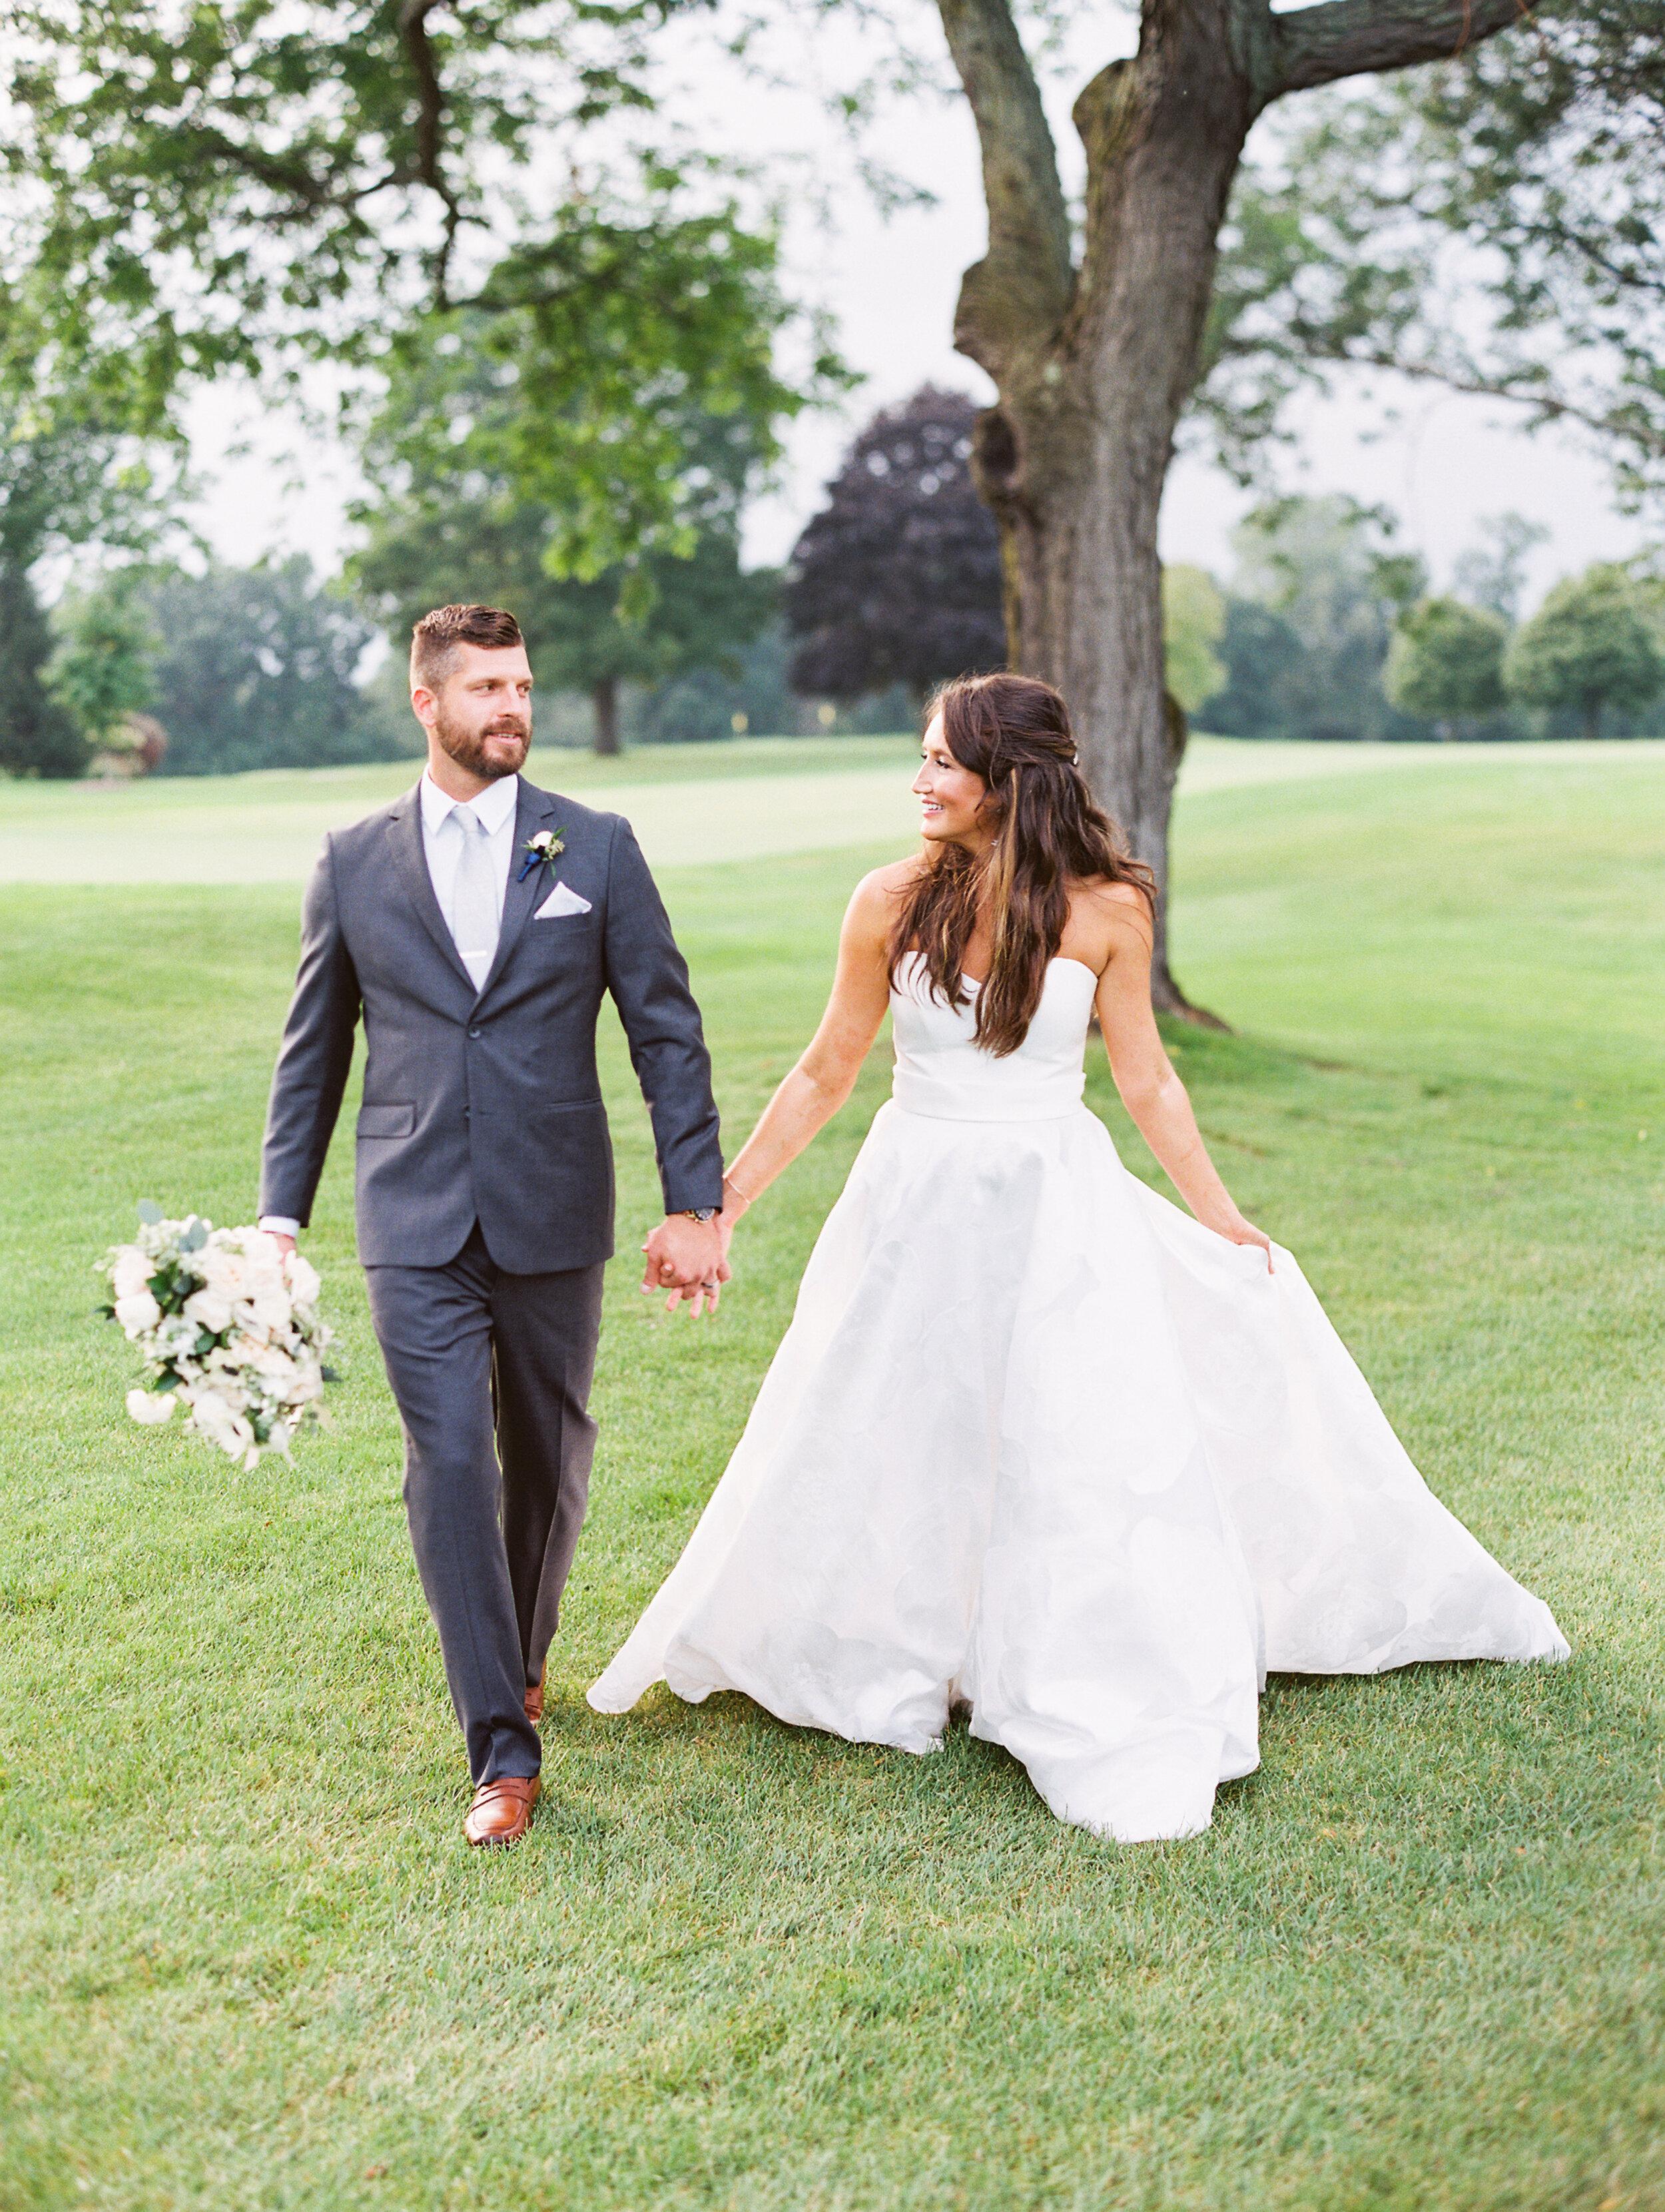 Kuiper+Wedding+Reception+Bridal+Party-155.jpg